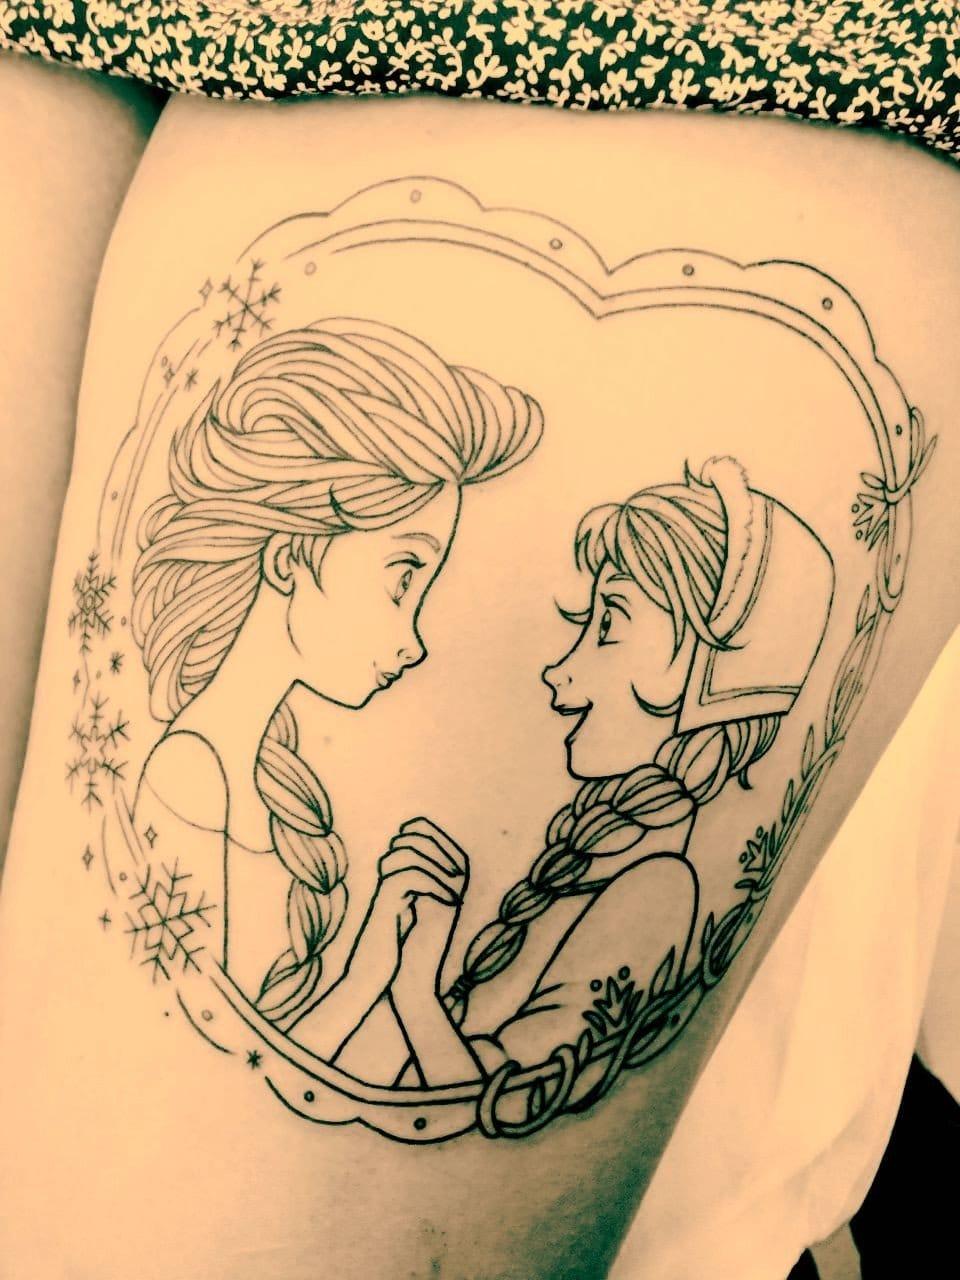 The beginning of a truely fancy frozen tattoo